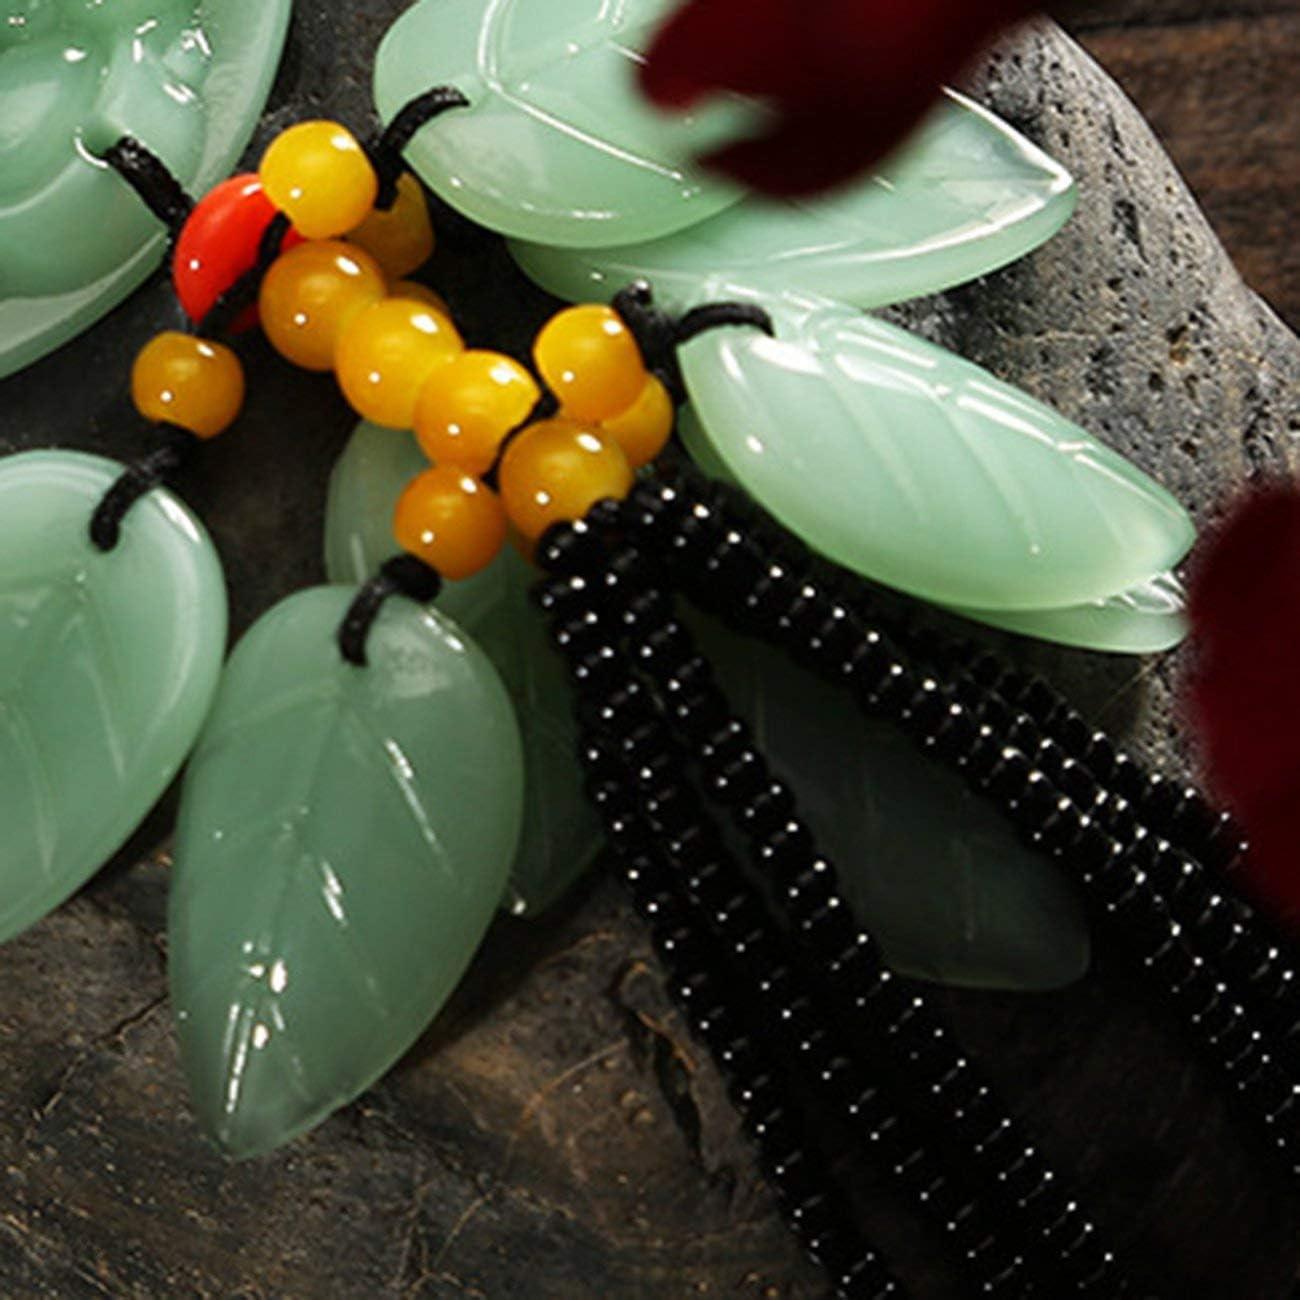 JIUY Auto Supplies New Pixiu Pendant Green Jade Lotus Gourd Creative Car Rearview Mirror Pendant Car Interior Decoration brave troops